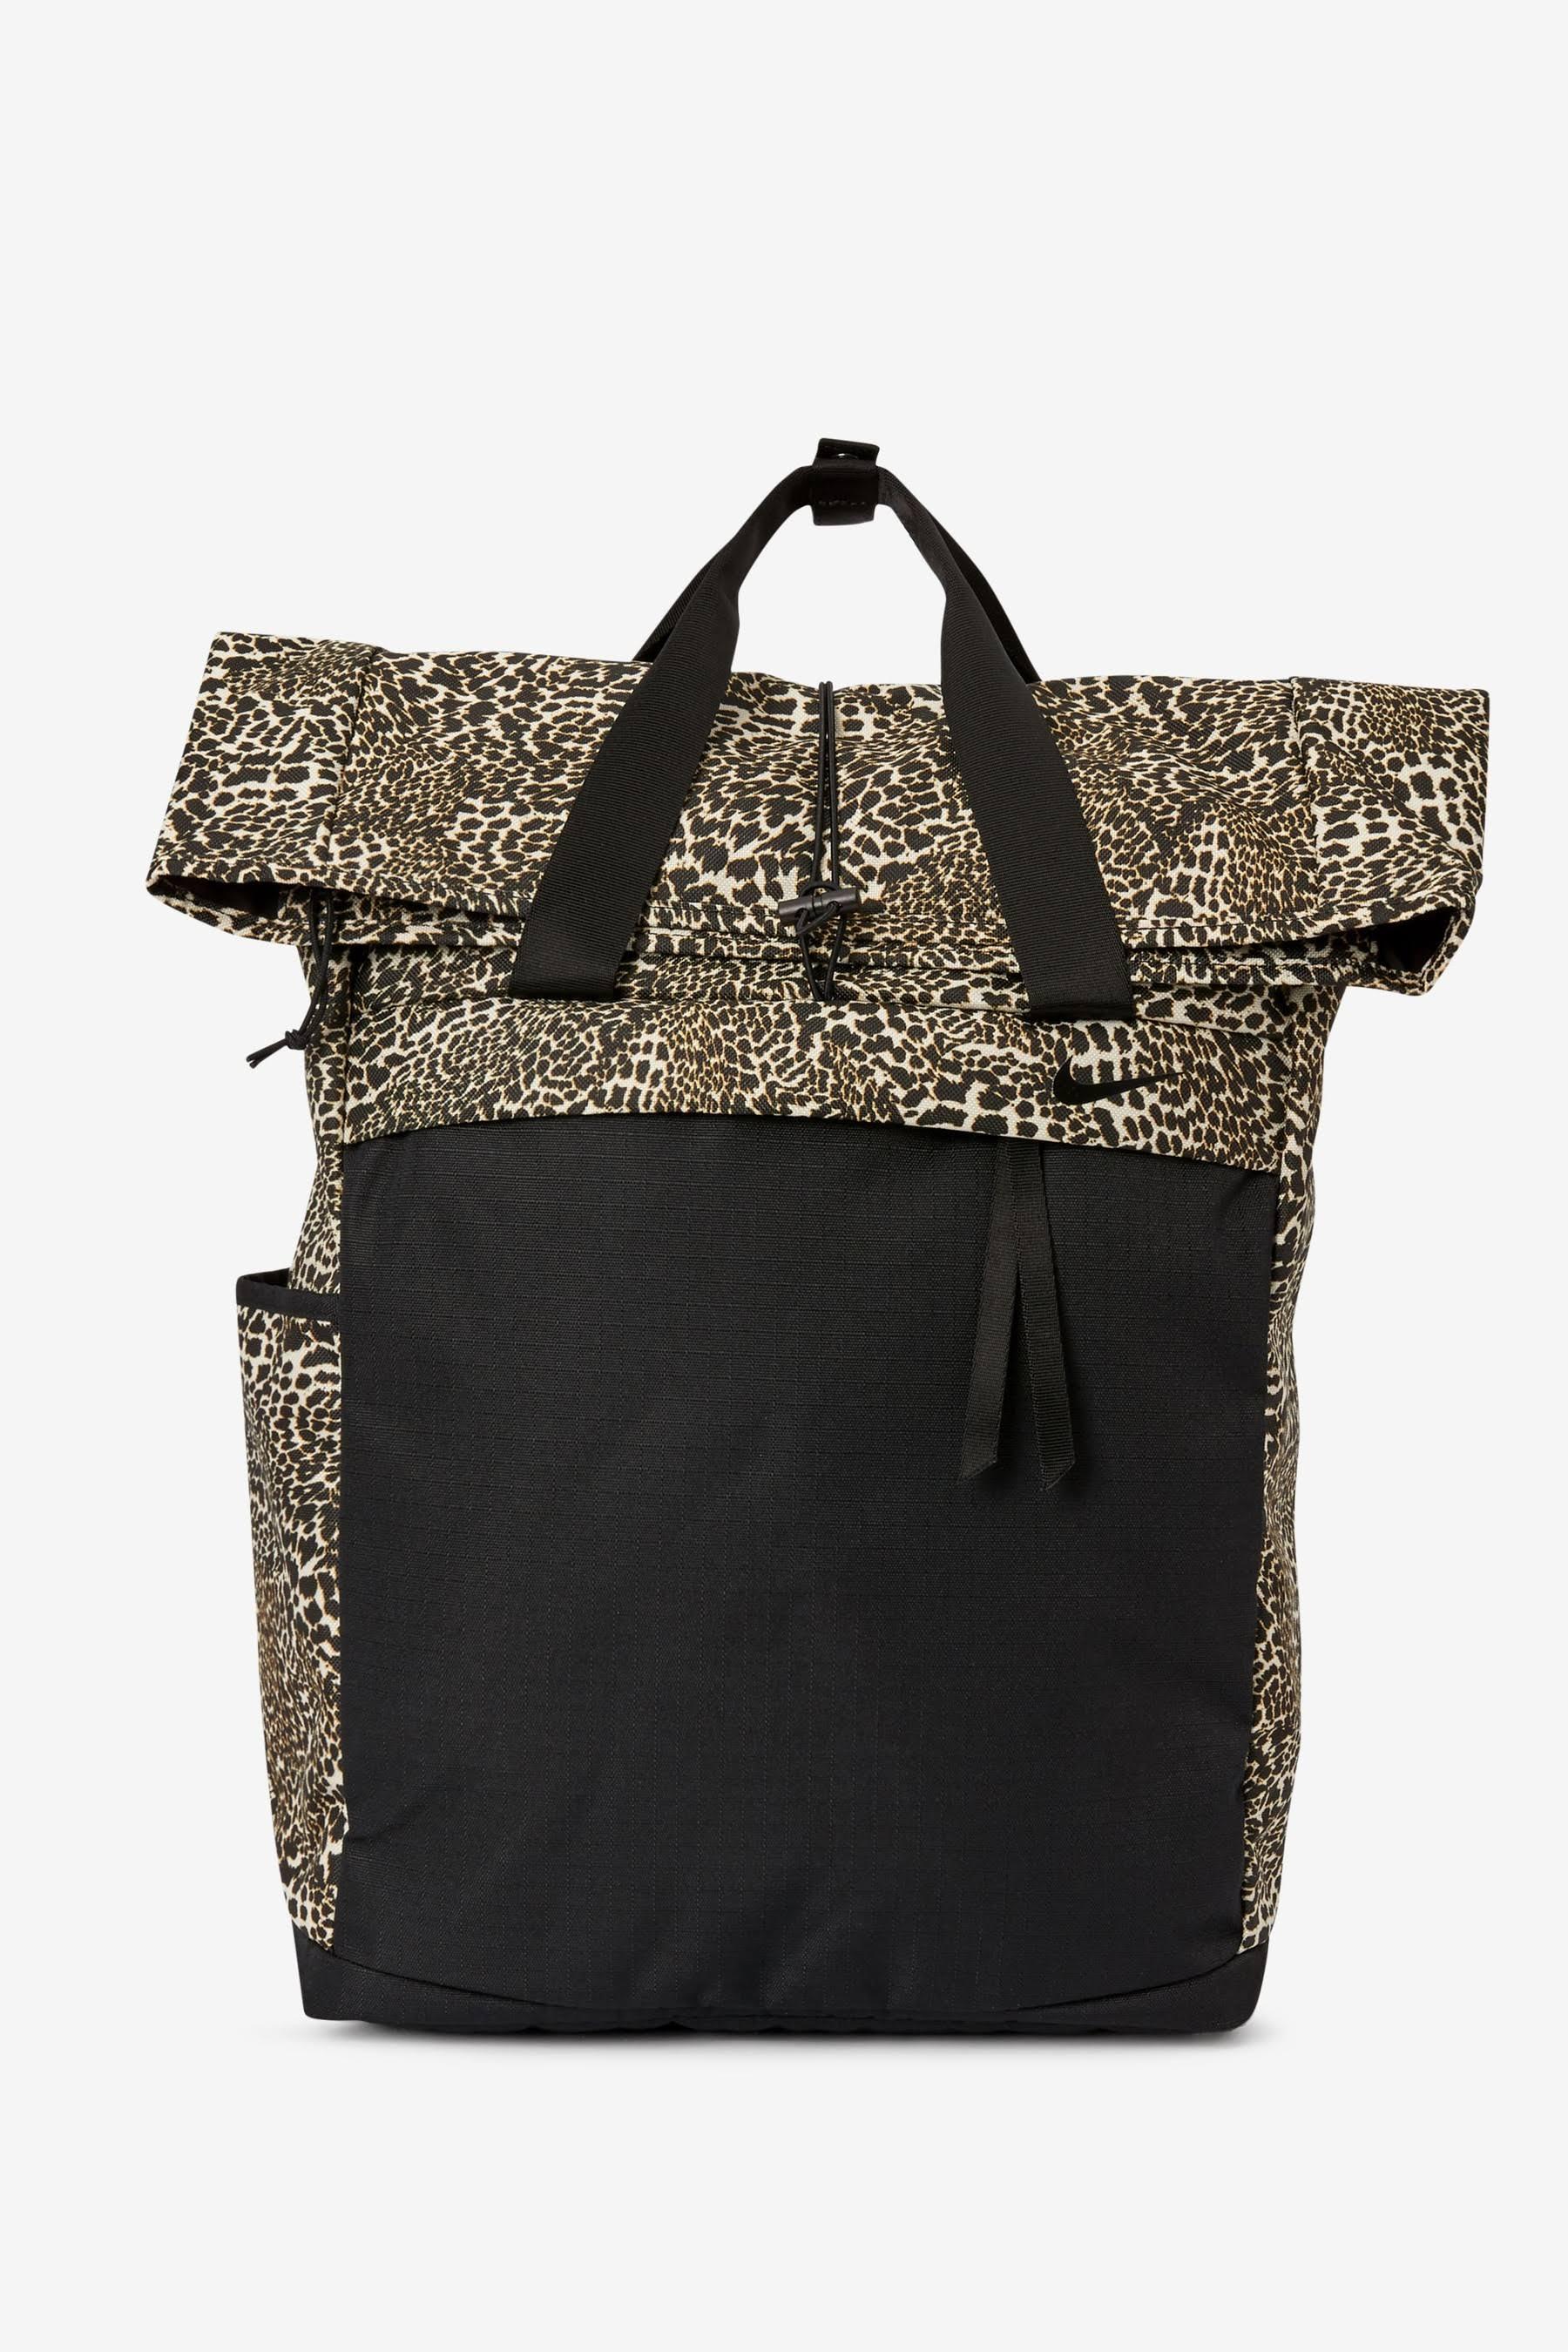 Nike Radiate Women's Leopard Training Backpack - Black